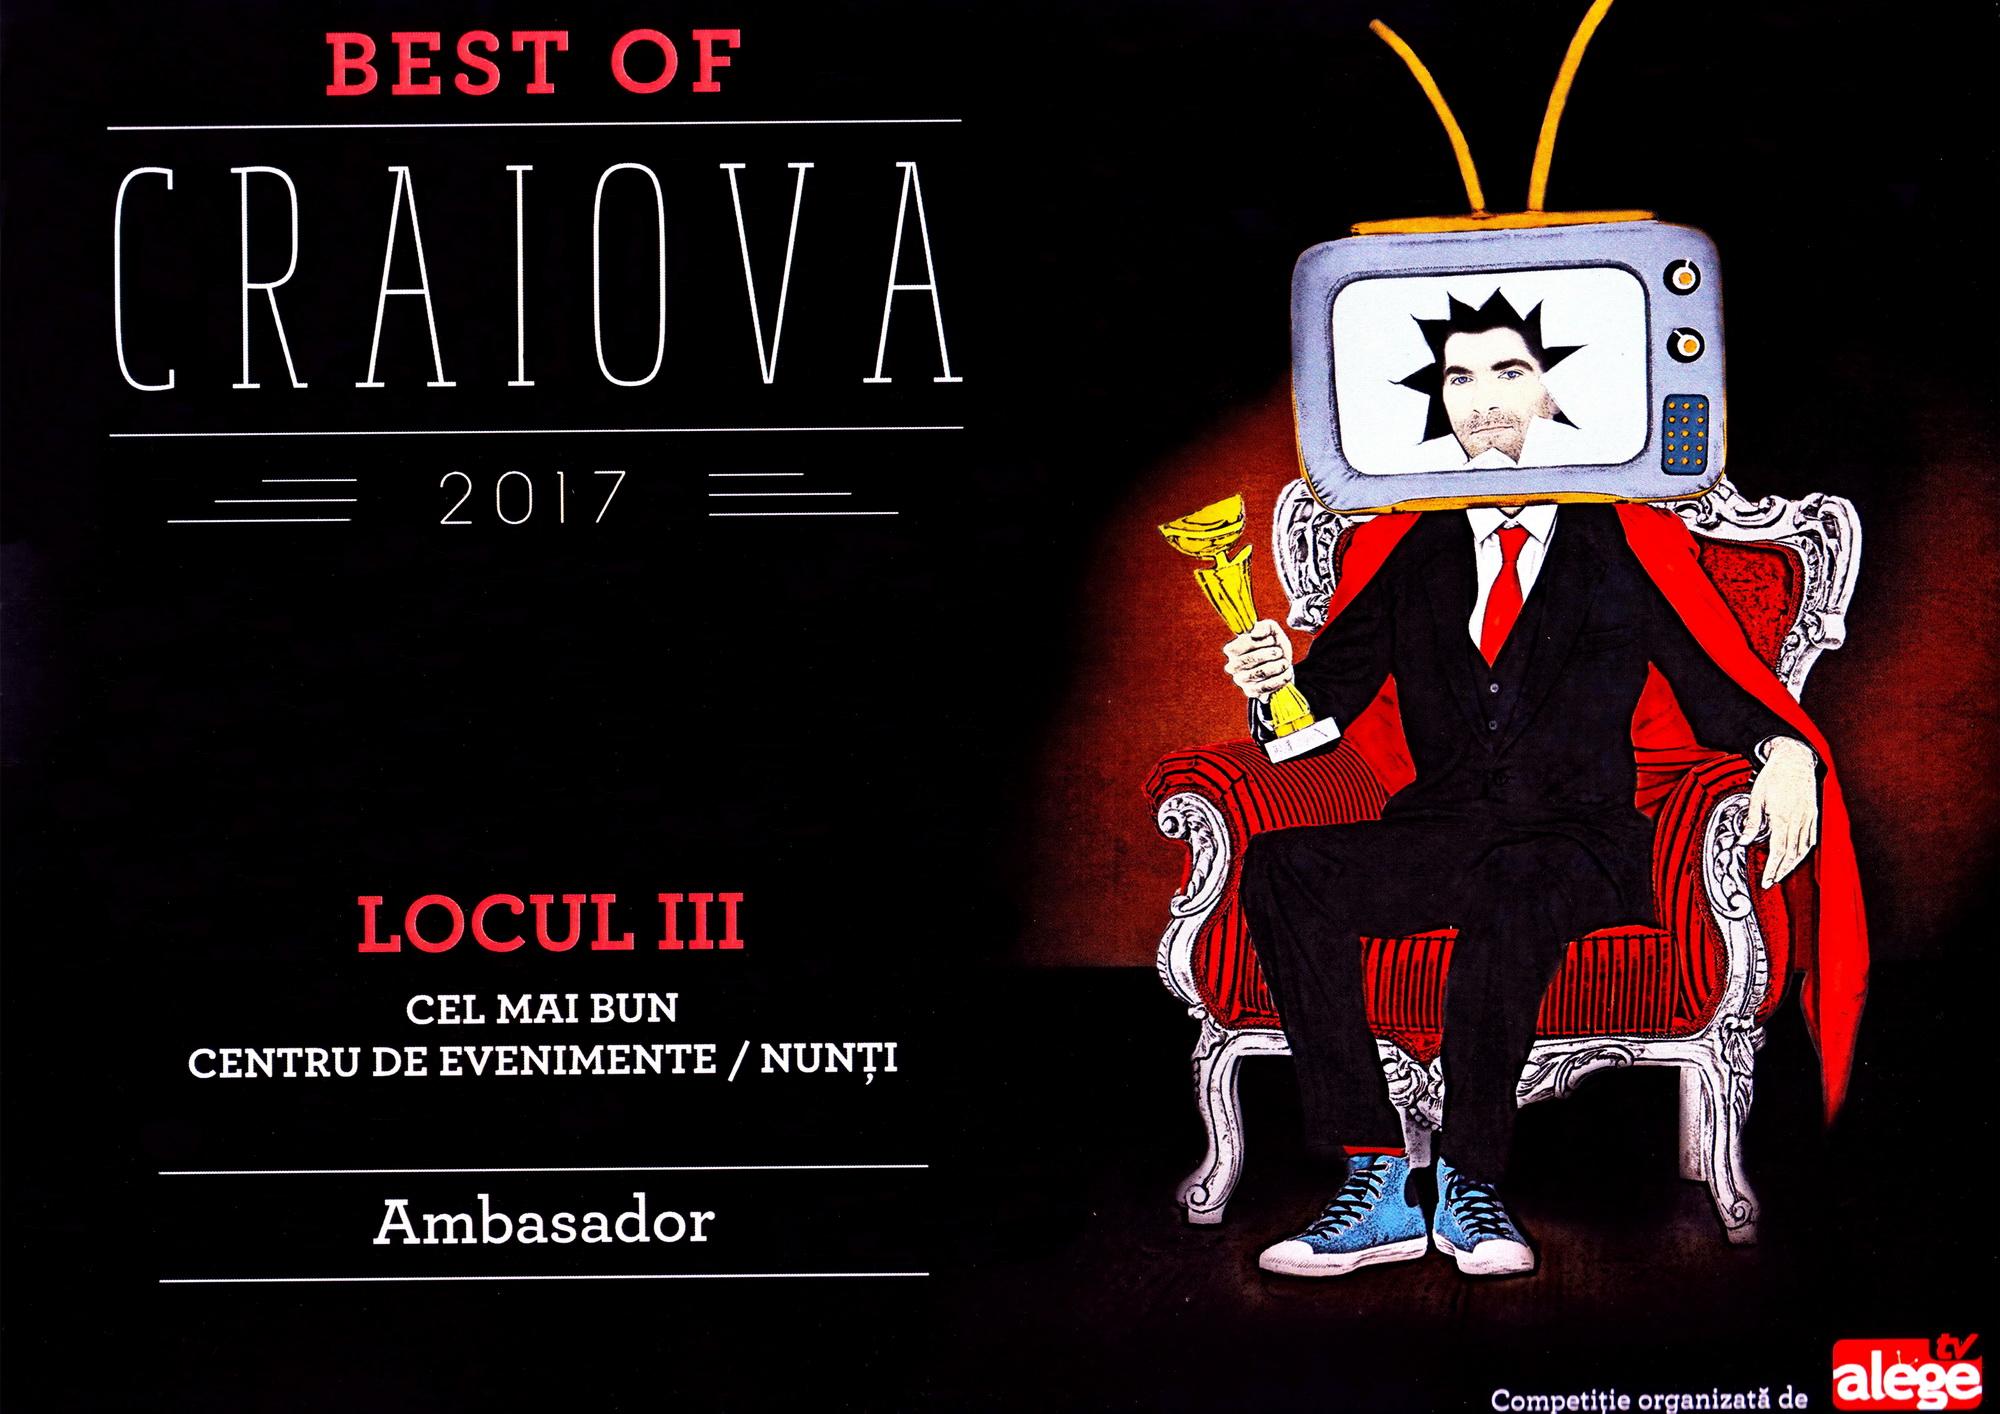 Best of Craiova 2017 | Restaurant Nunta Craiova | Restaurant Ambasador Craiova